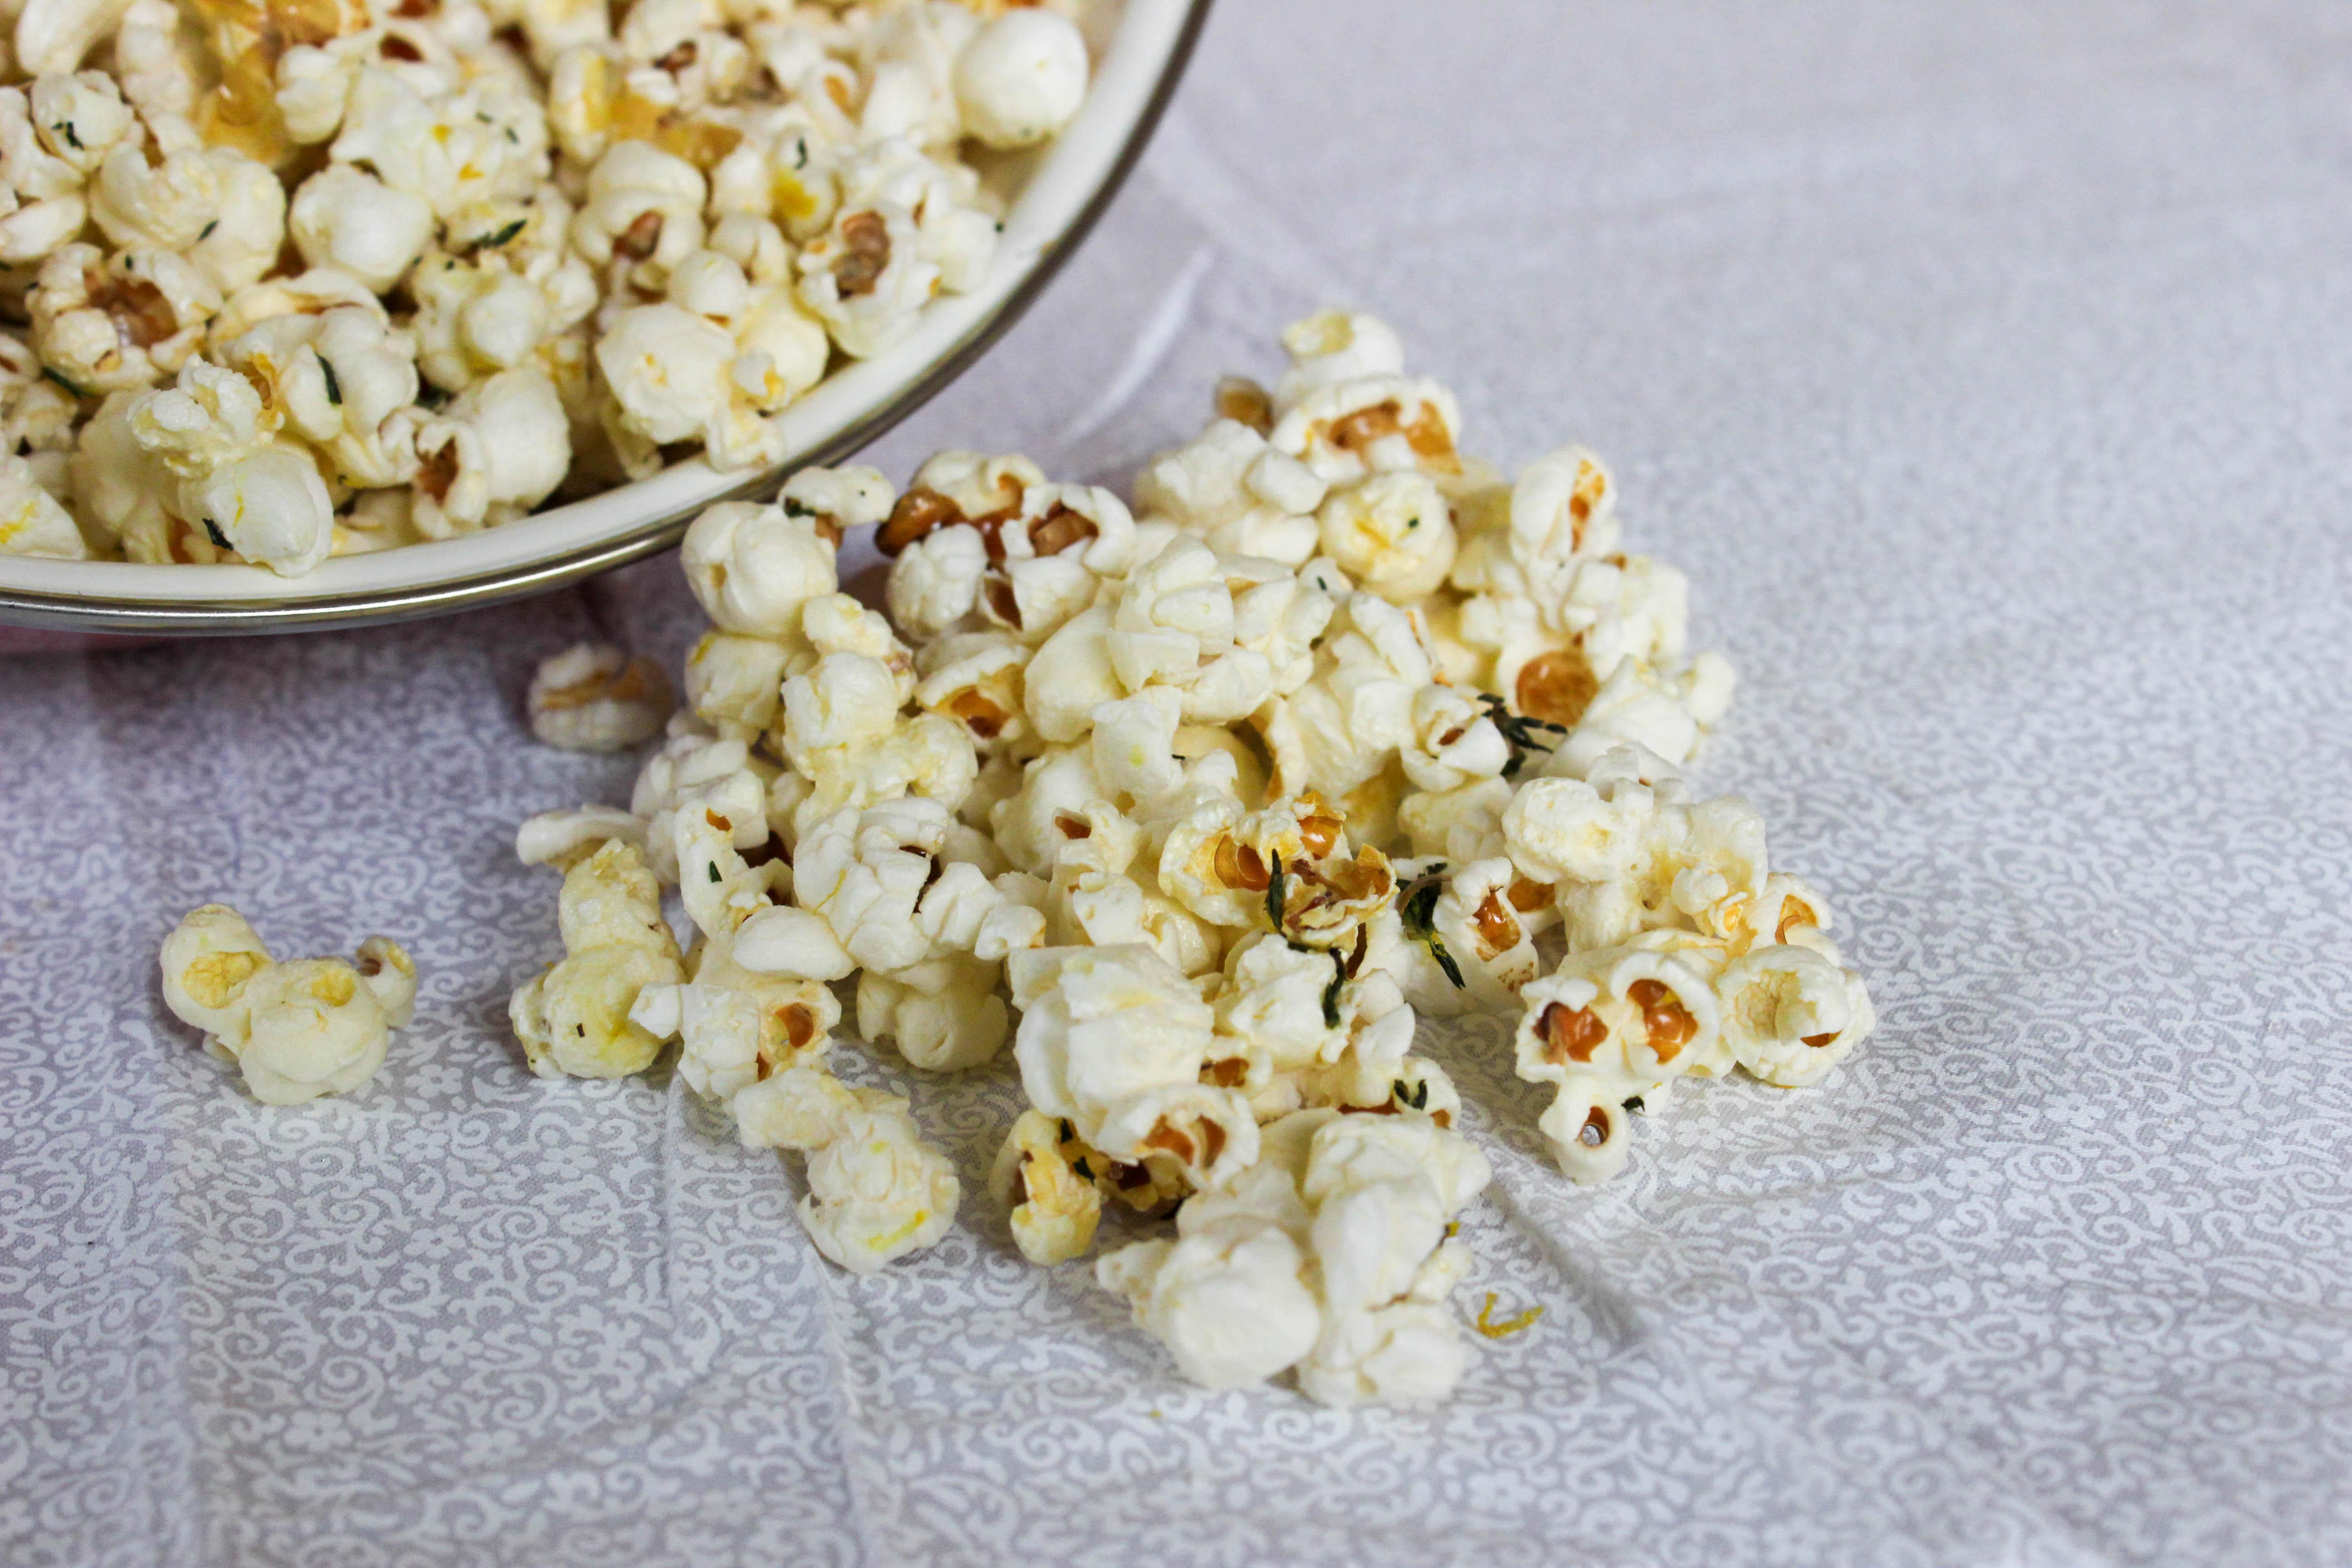 Lemon Thyme Popcorn